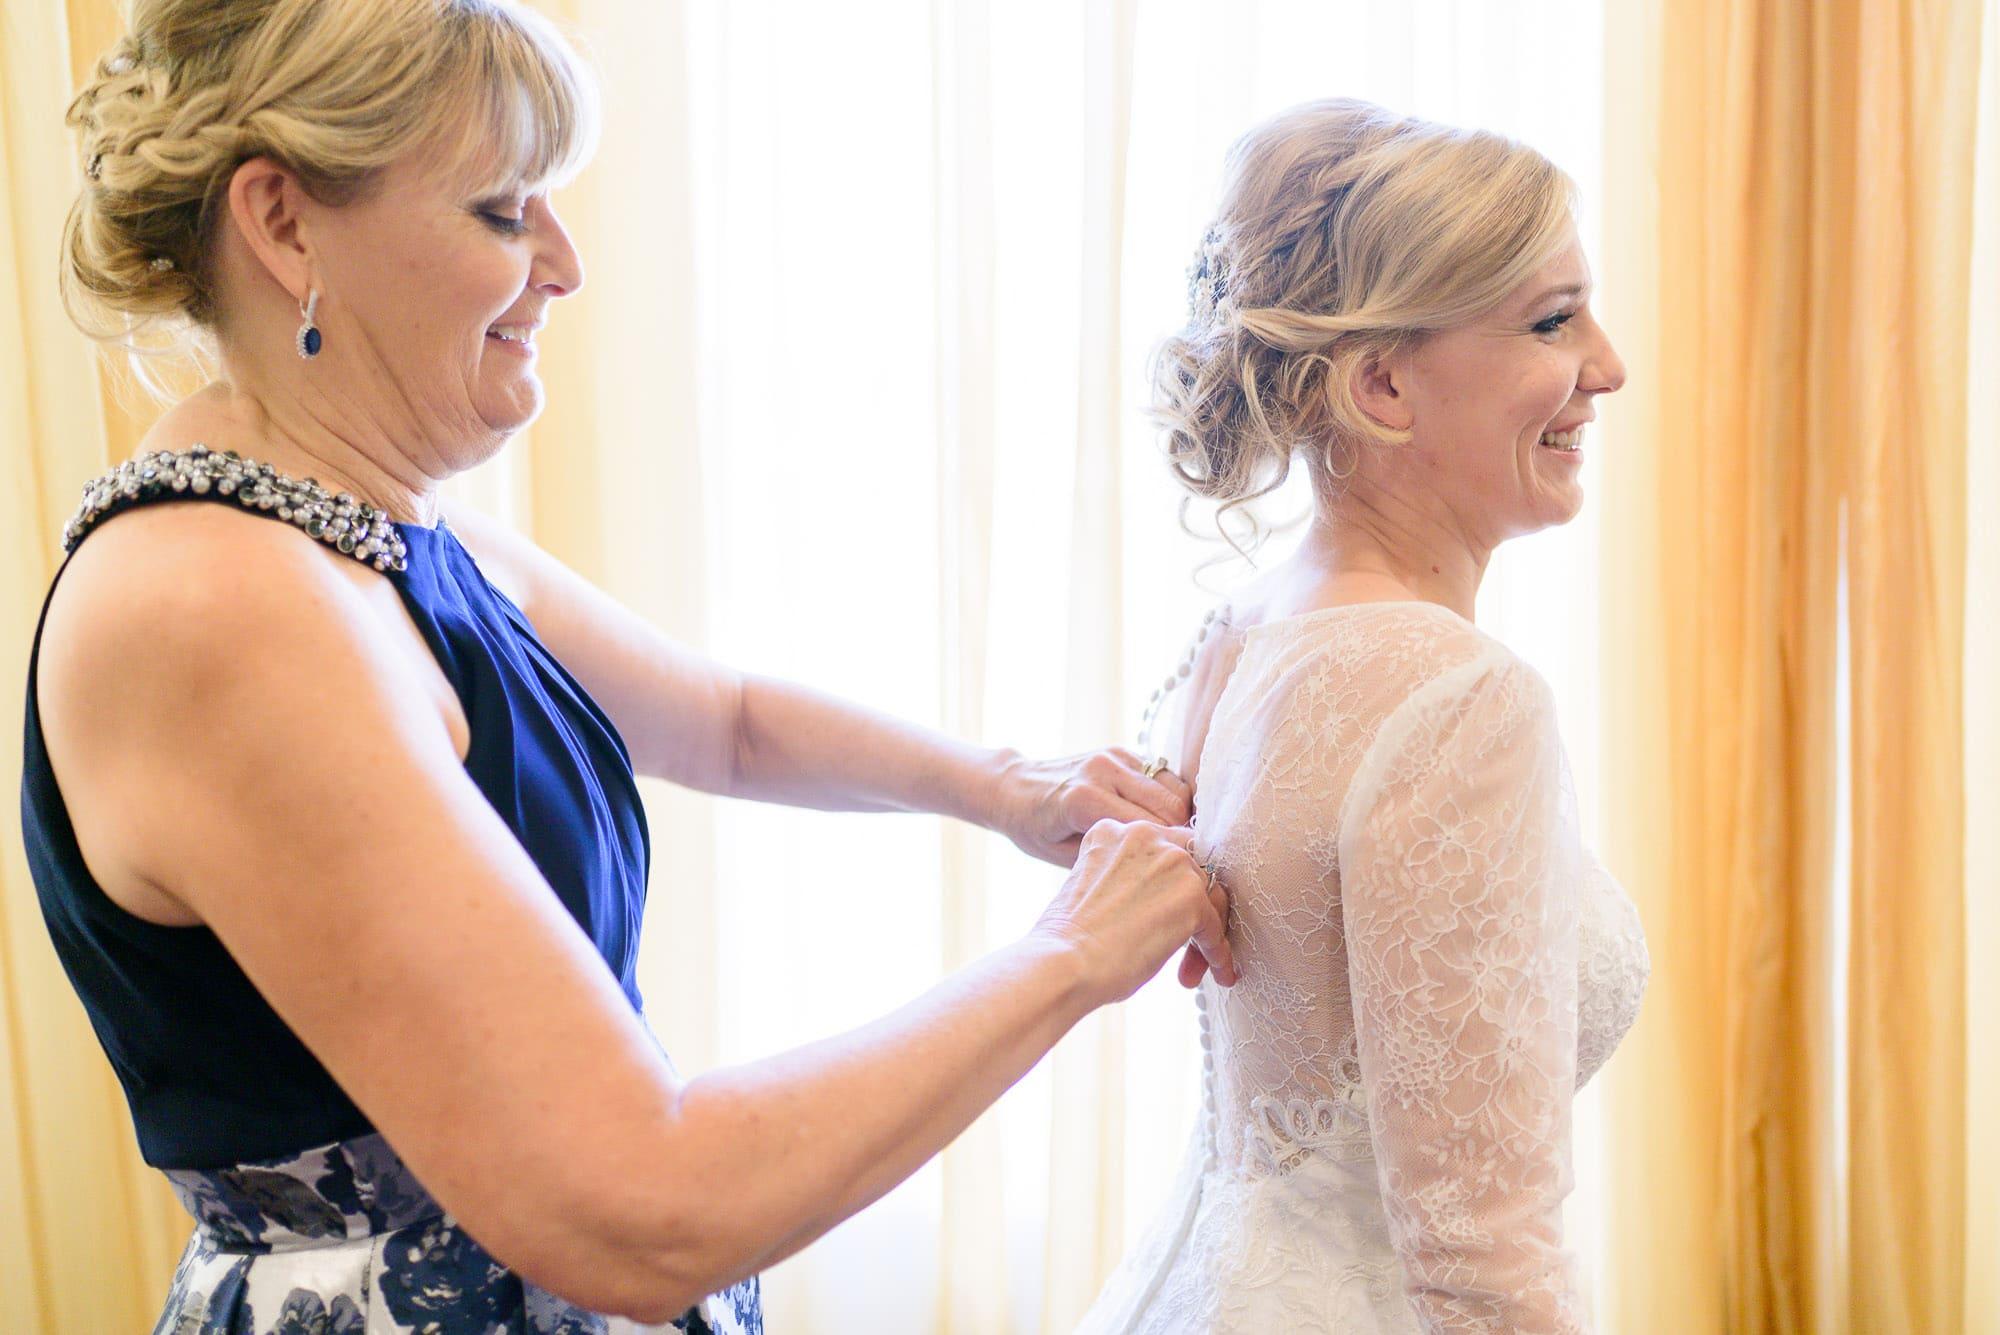 013_Alan_and_Heidi_Los_Angeles_Equestrian_Center_Wedding